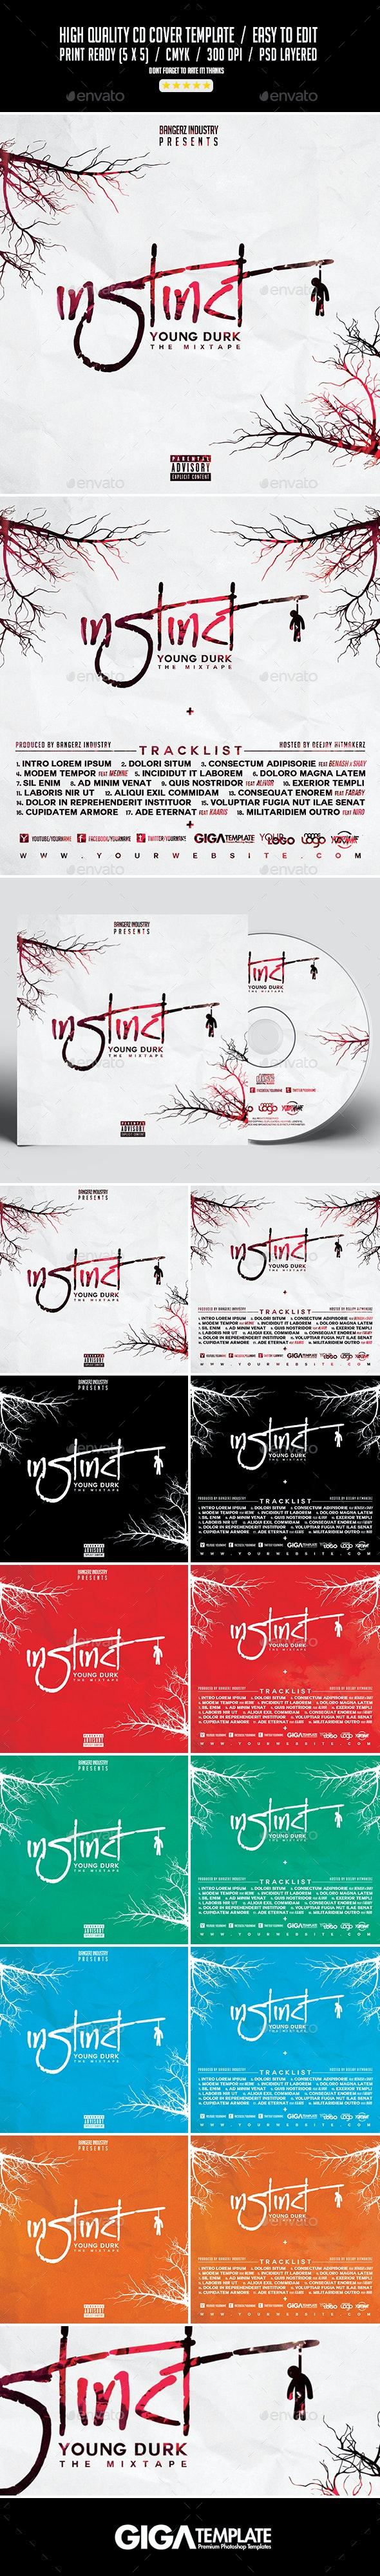 Instinct   Urban Music Album Mixtape CD Cover Template - CD & DVD Artwork Print Templates